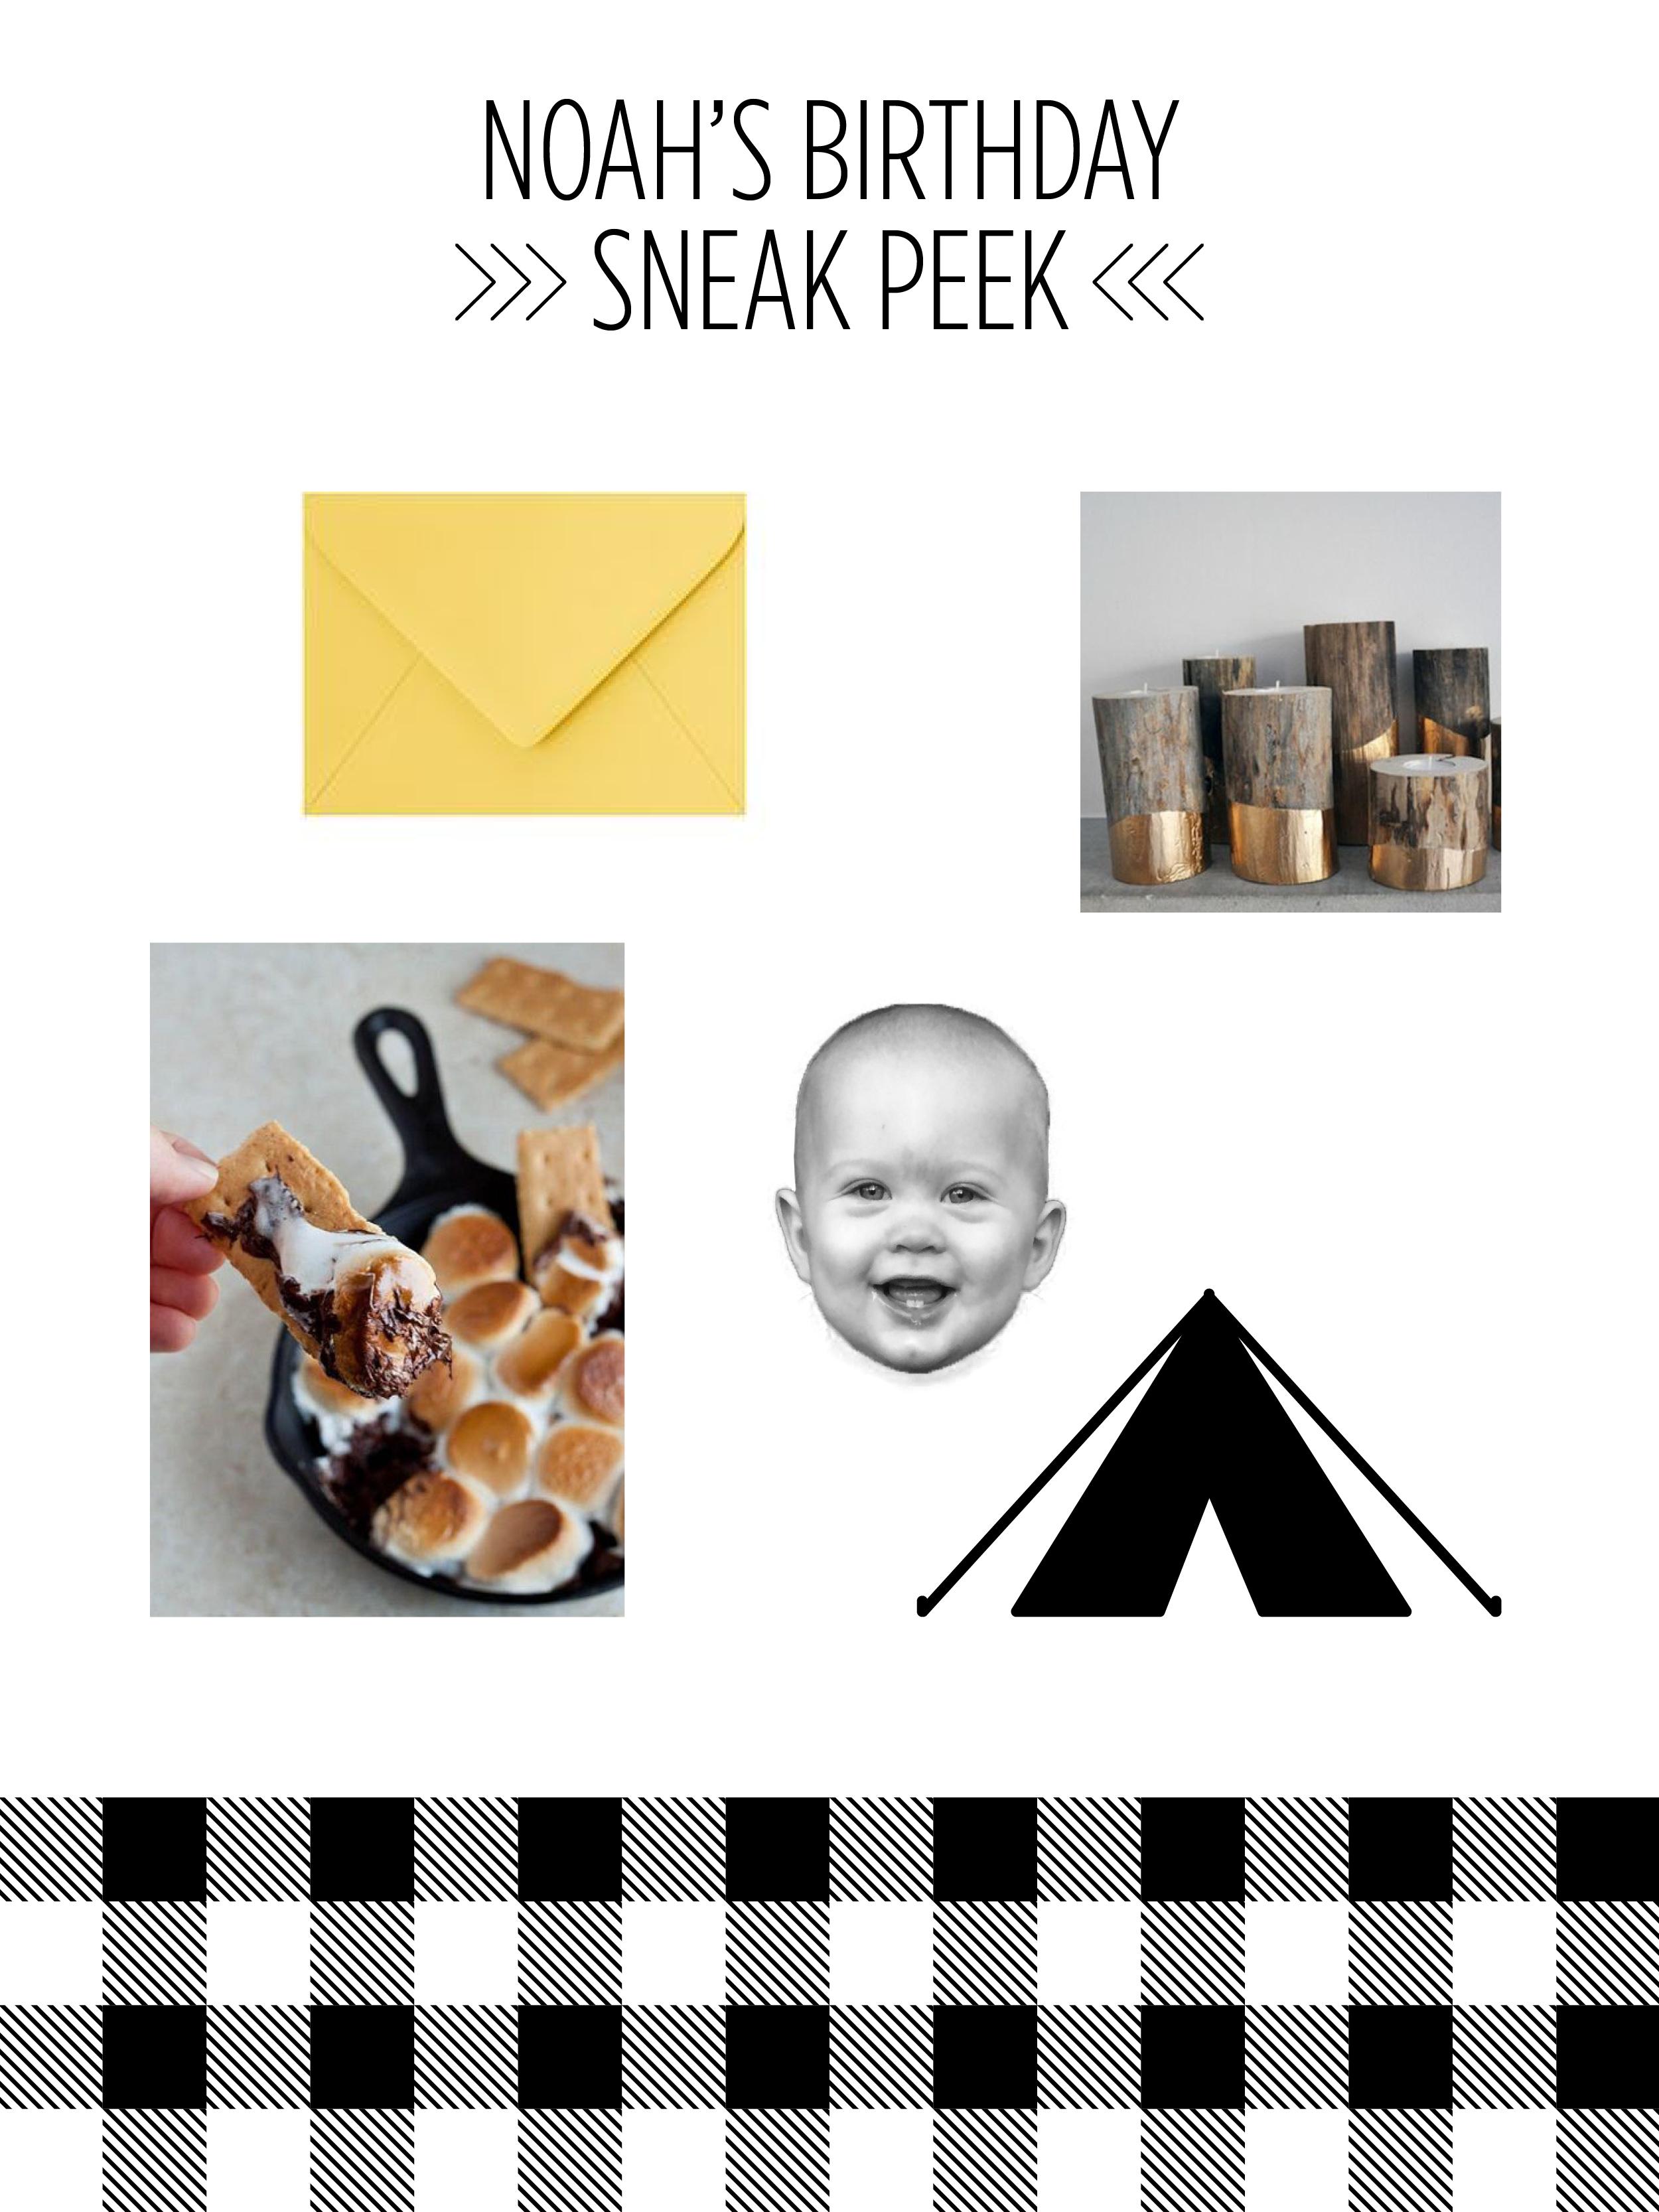 Sneak Peek: Noah's Birthday